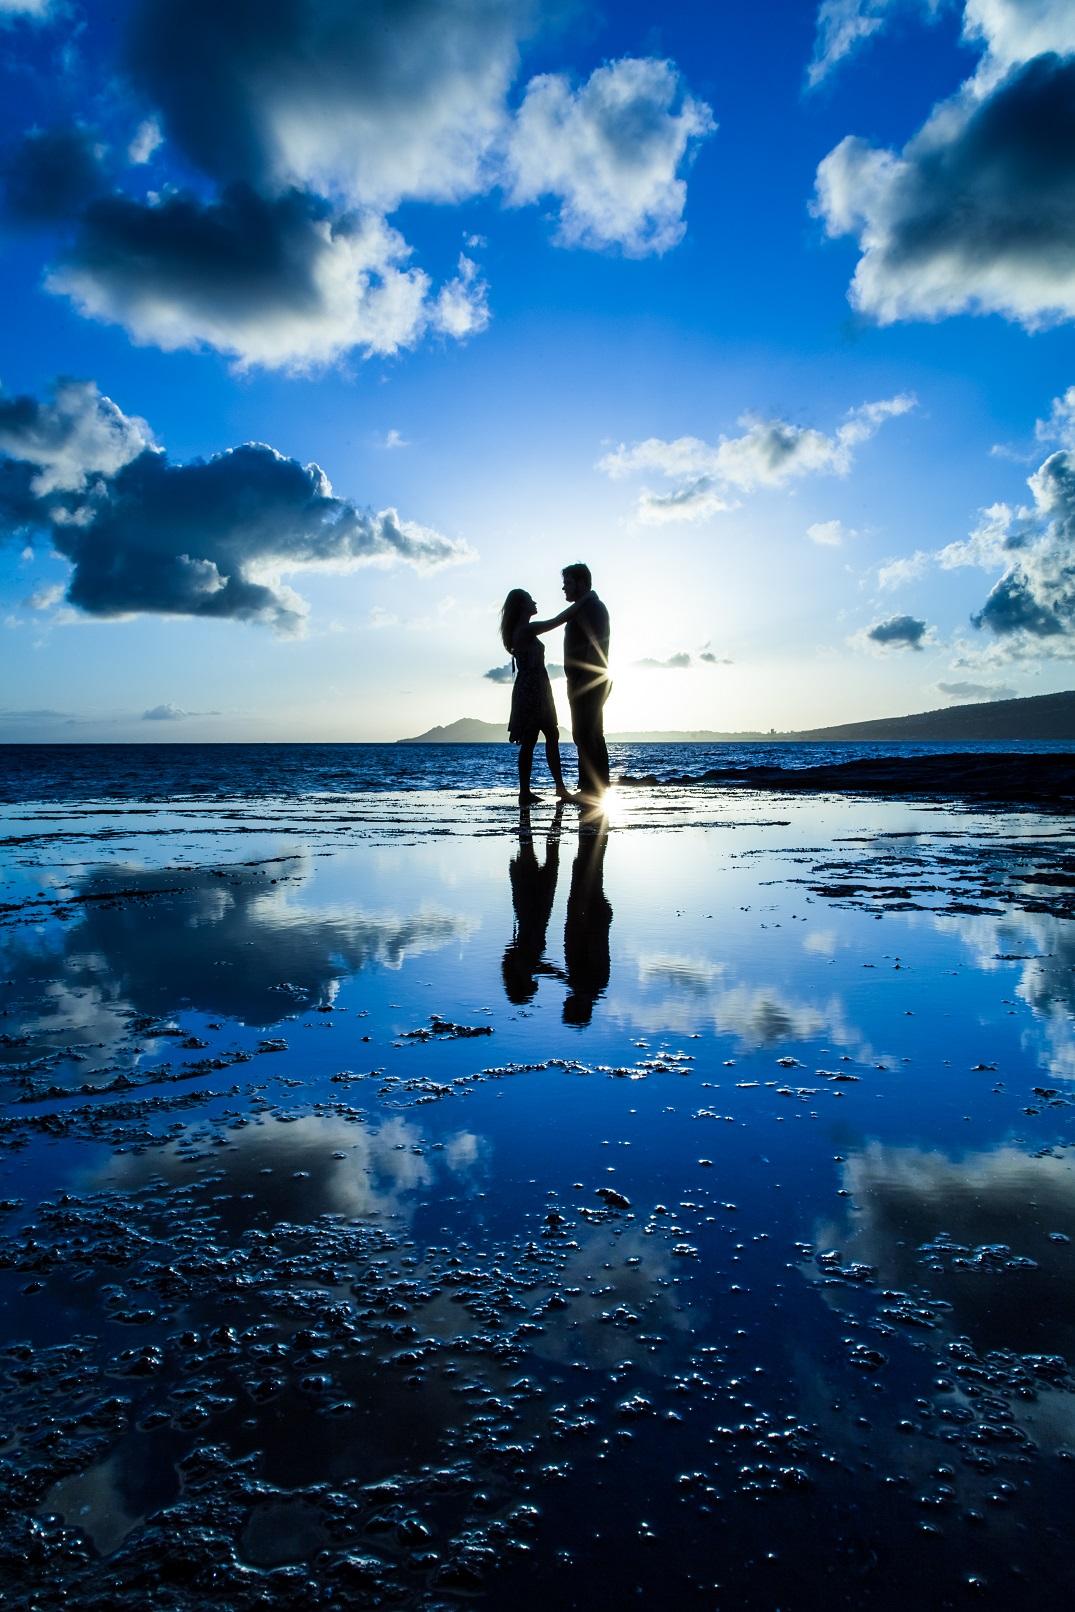 honolulu photographer silhouette beach sunset ocean reflection pool